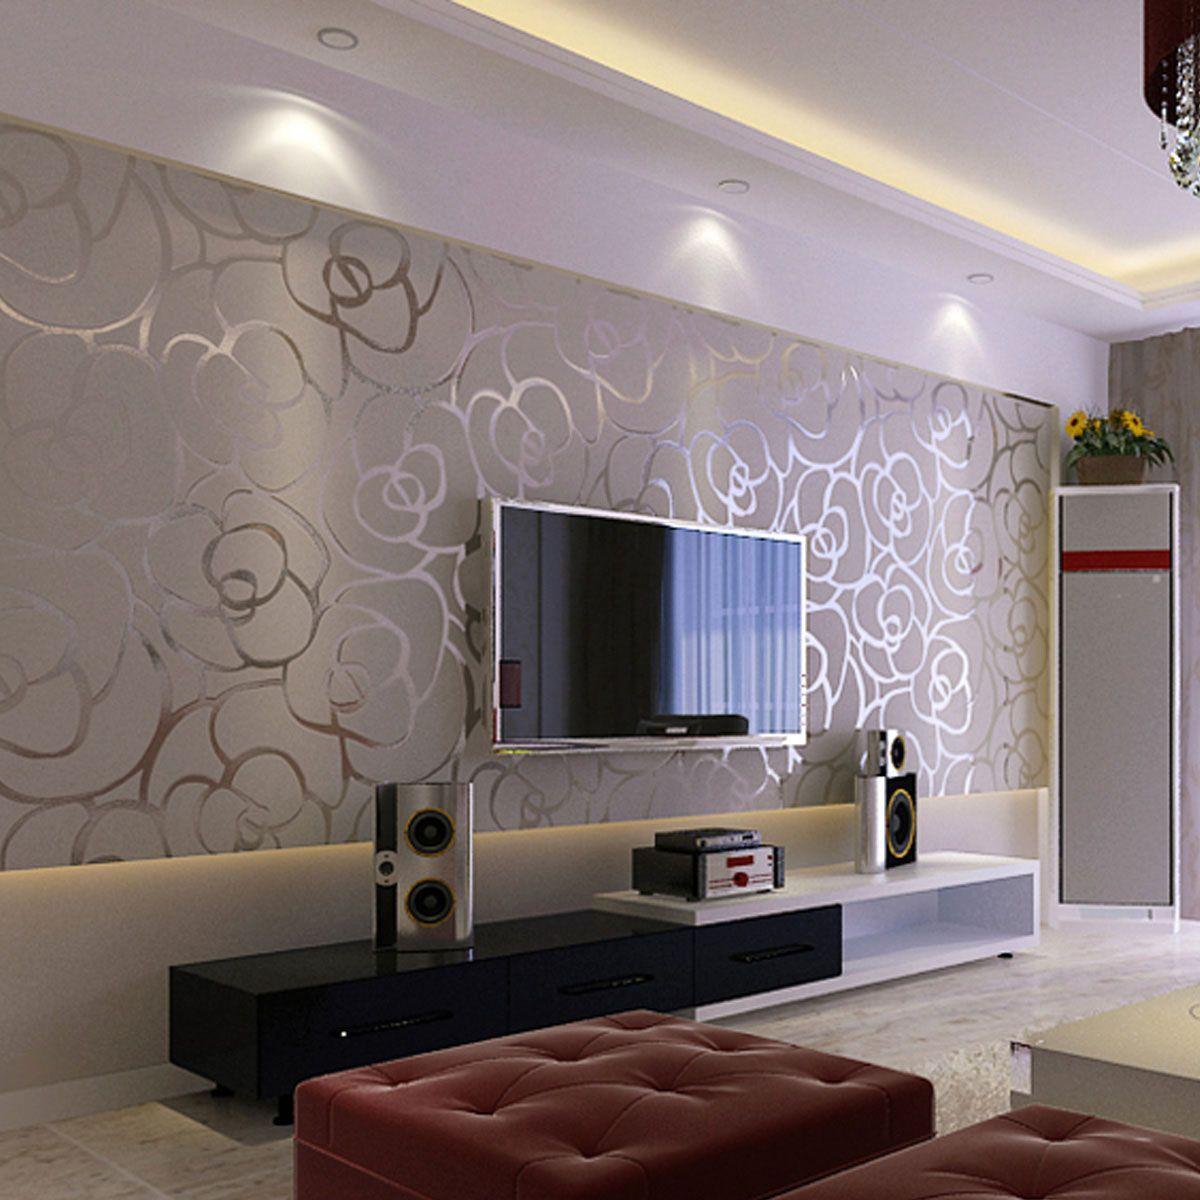 Modern Wallpaper For Walls Full Free Hd Wallpapers Modern Wallpaper Living Room Wallpaper Living Room Room Wallpaper Designs